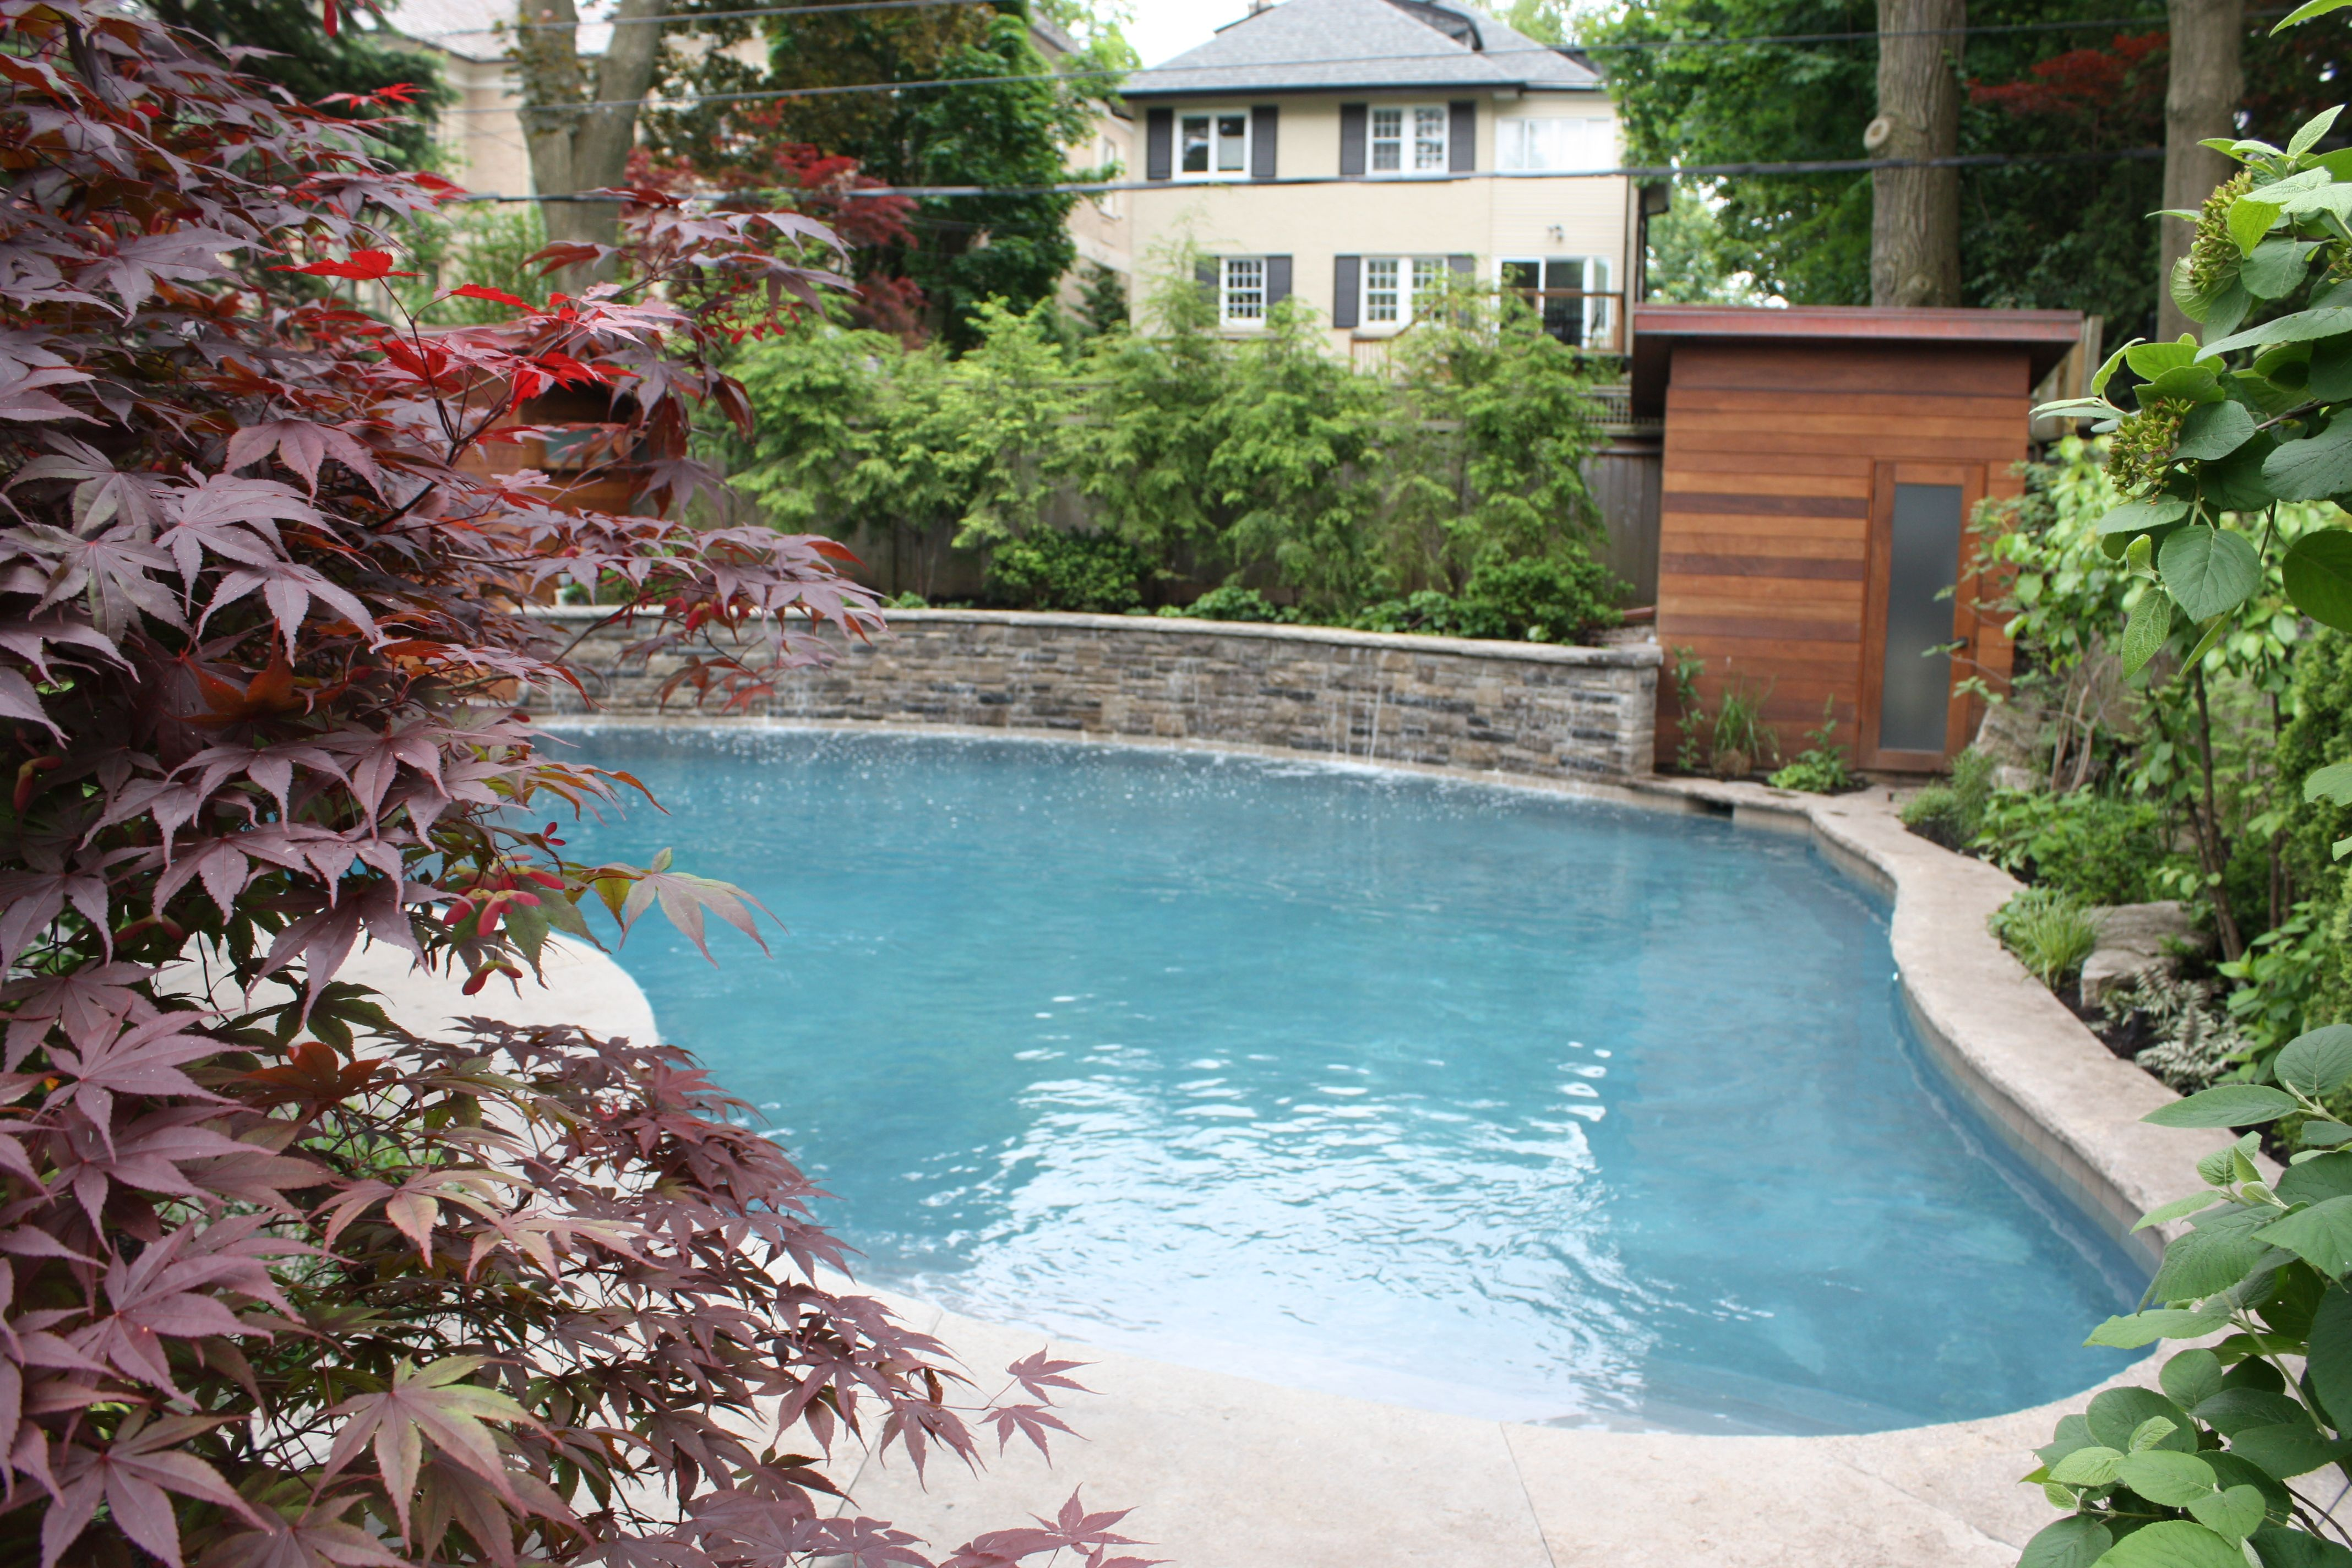 Pretty backyard pool area with waterfall